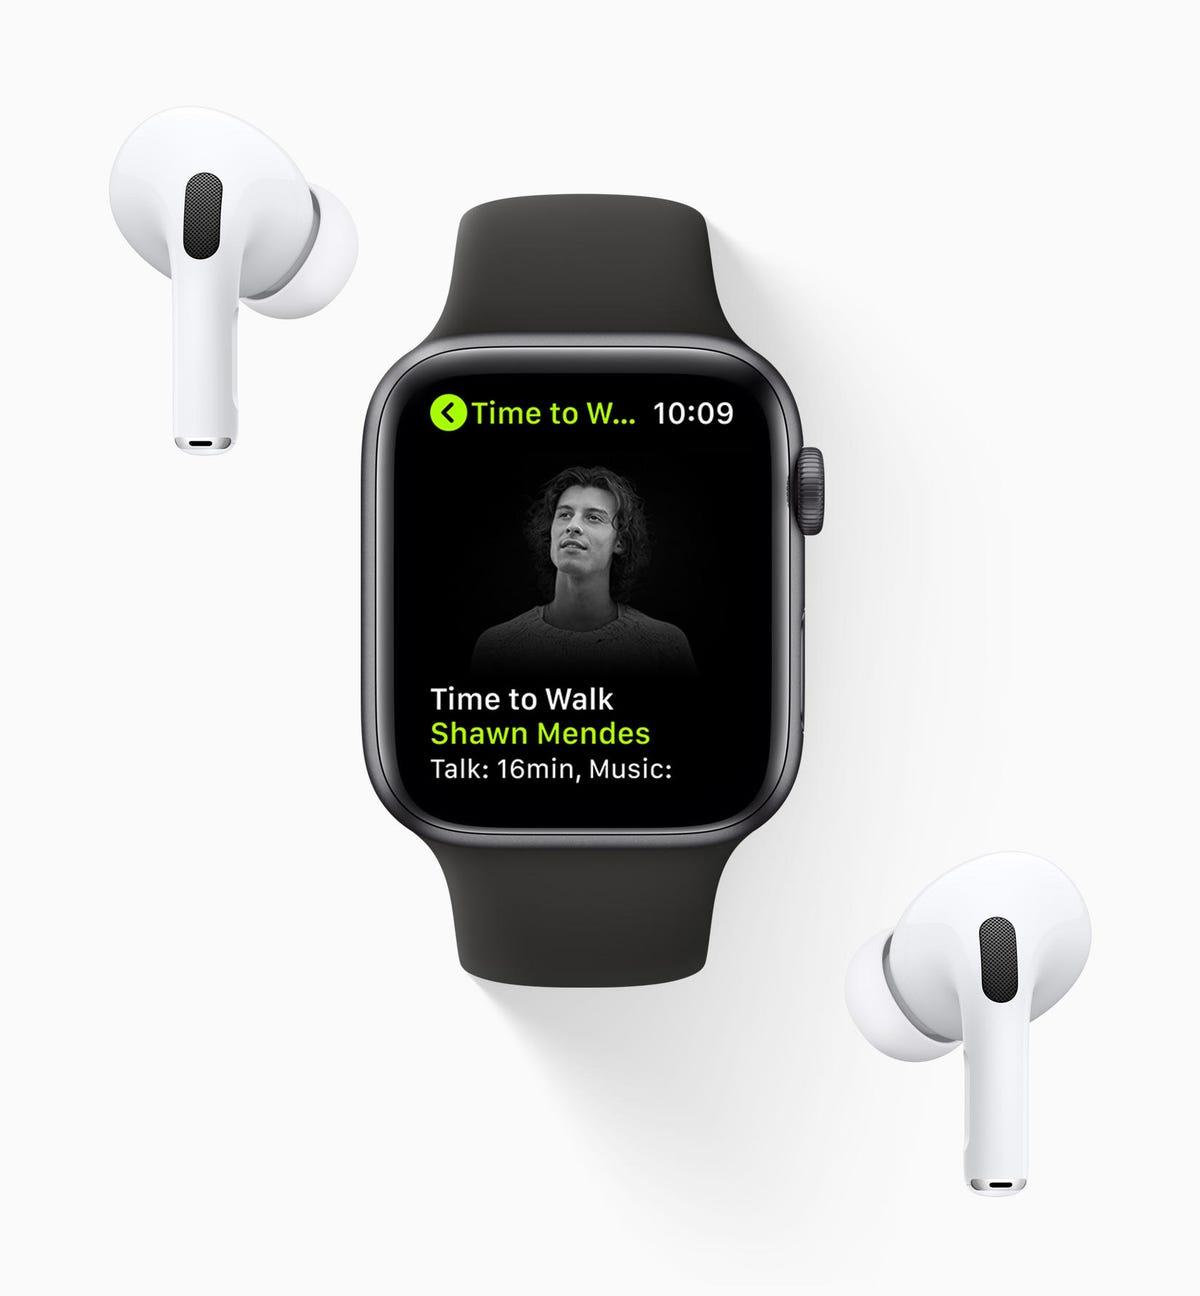 apple-time-to-walk-apple-watch-airpods-01252021.jpg